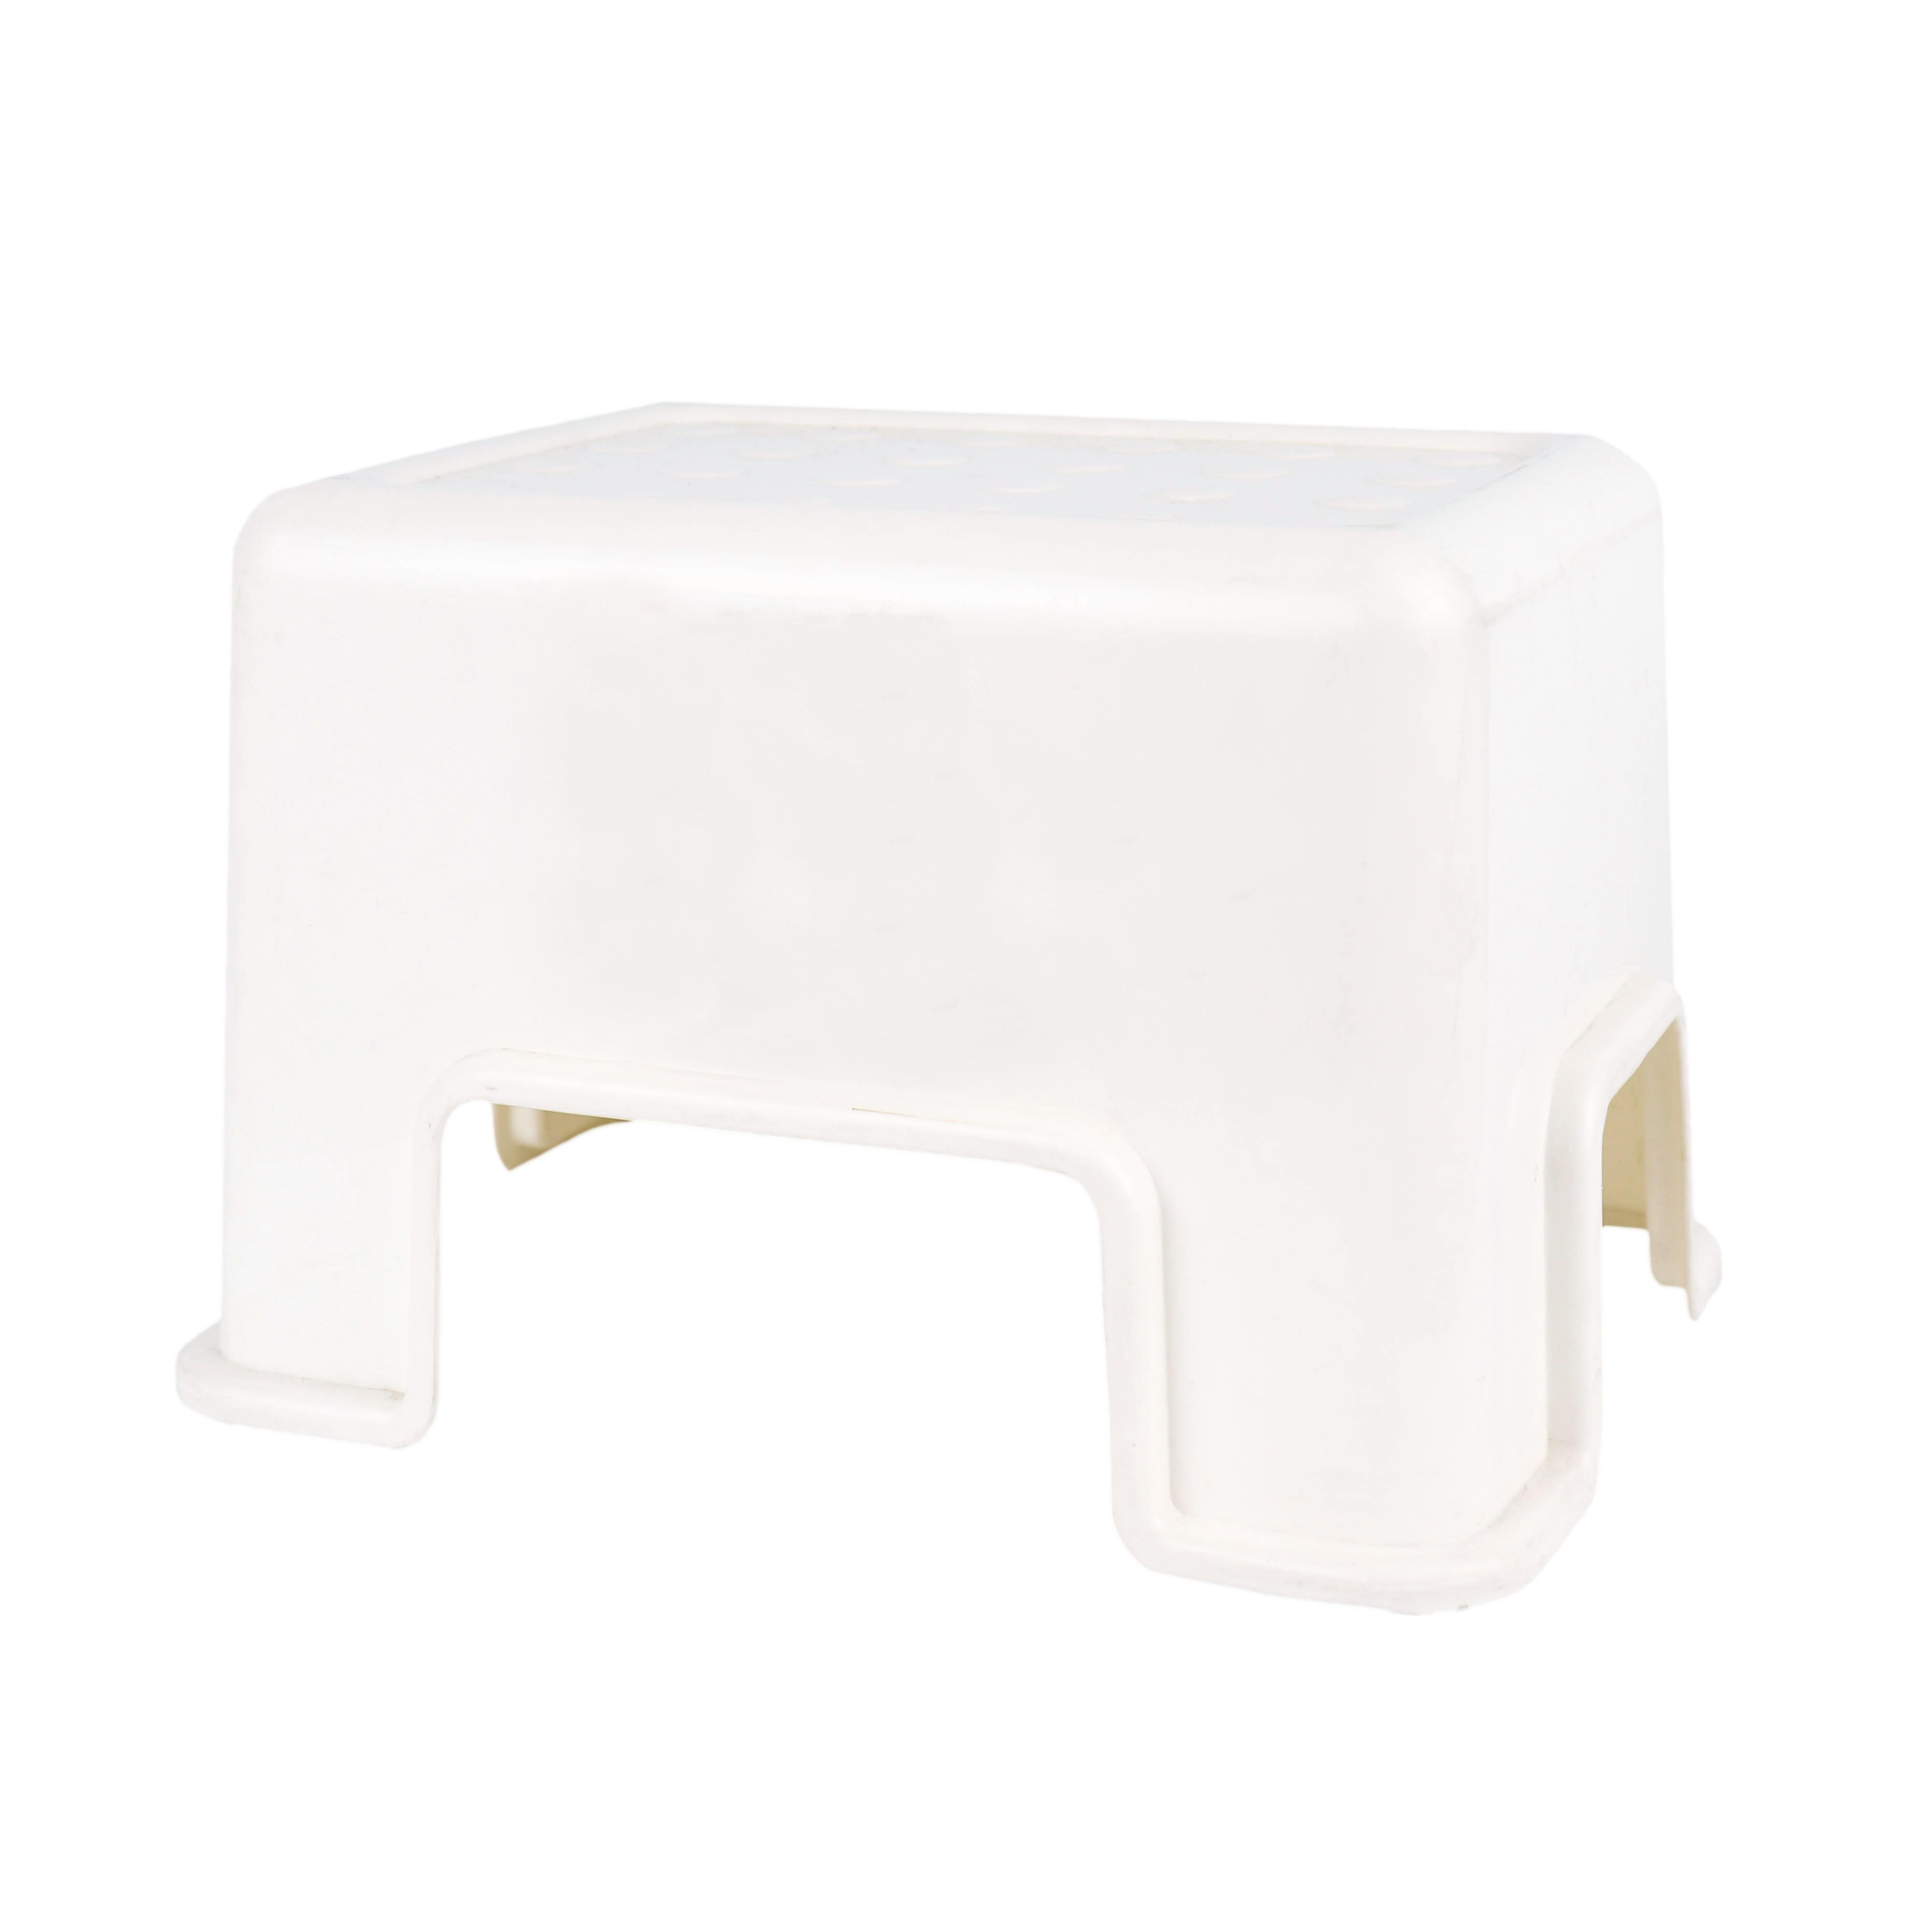 Plastic Bath Stool 1168 View Plastic Bath Stool Micron Ware Product Details From J C P Plastic Ltd Part On Alibaba Com